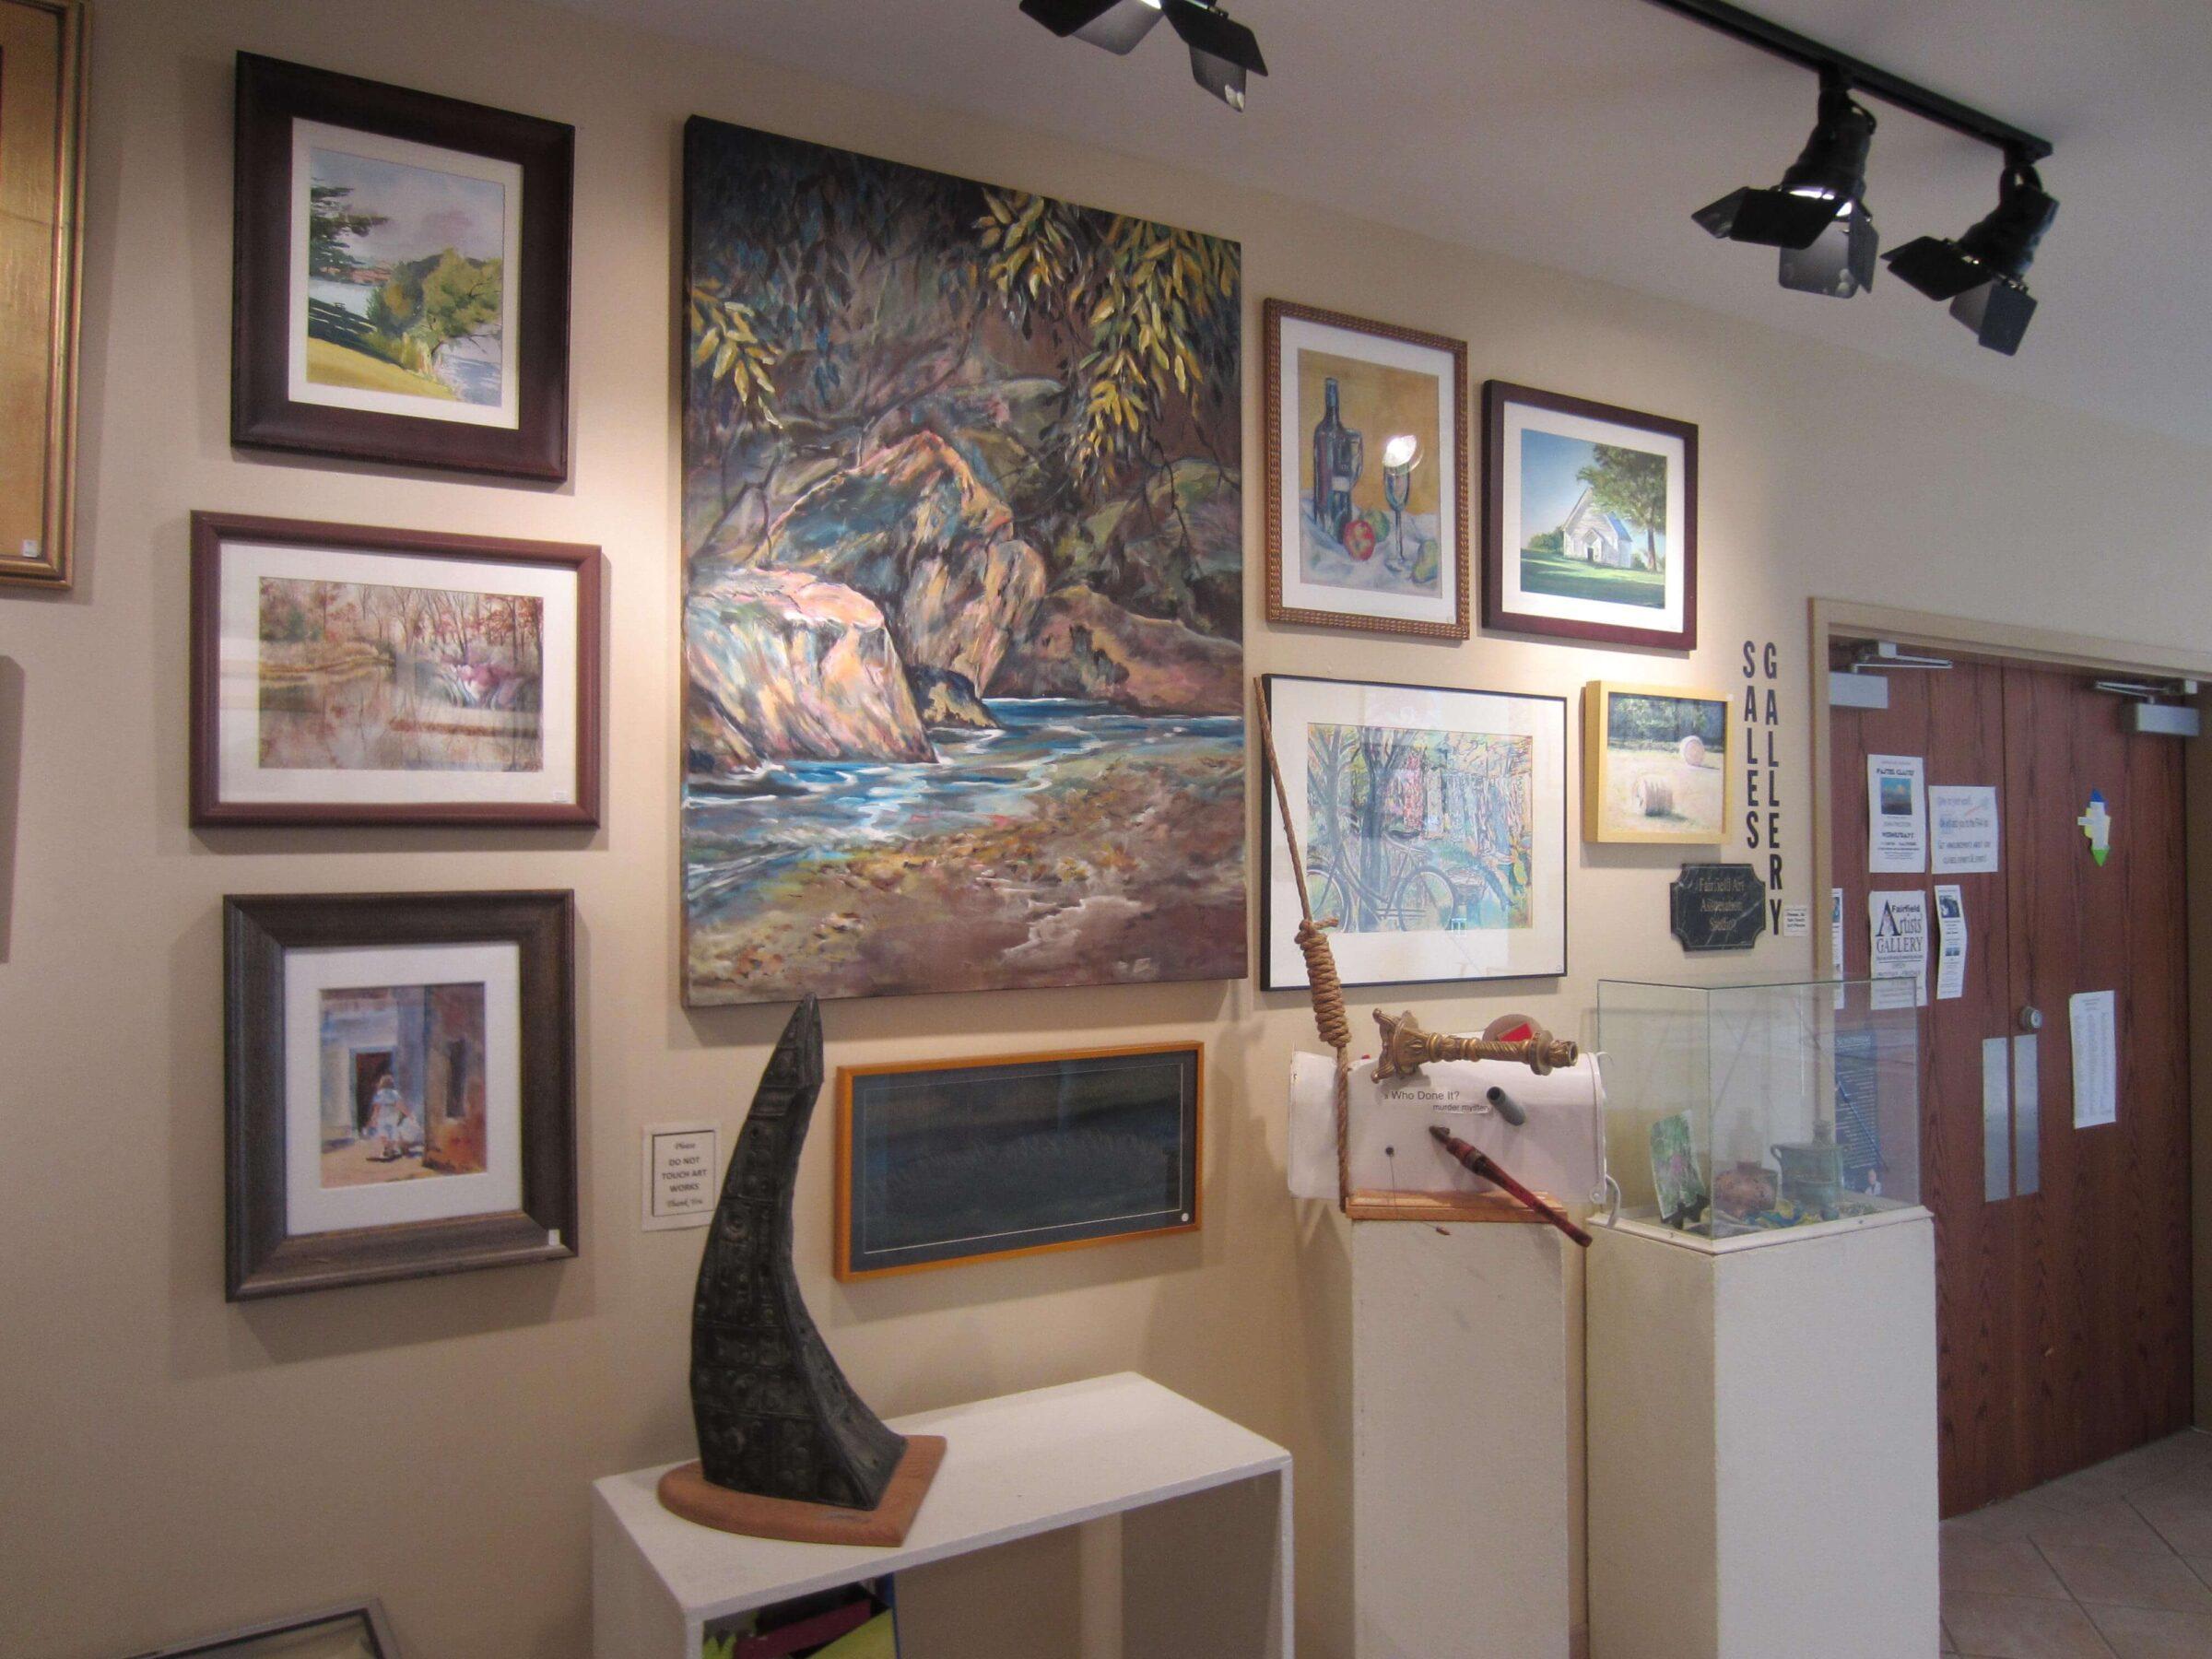 Fairfield Art Association Galleries & Studio